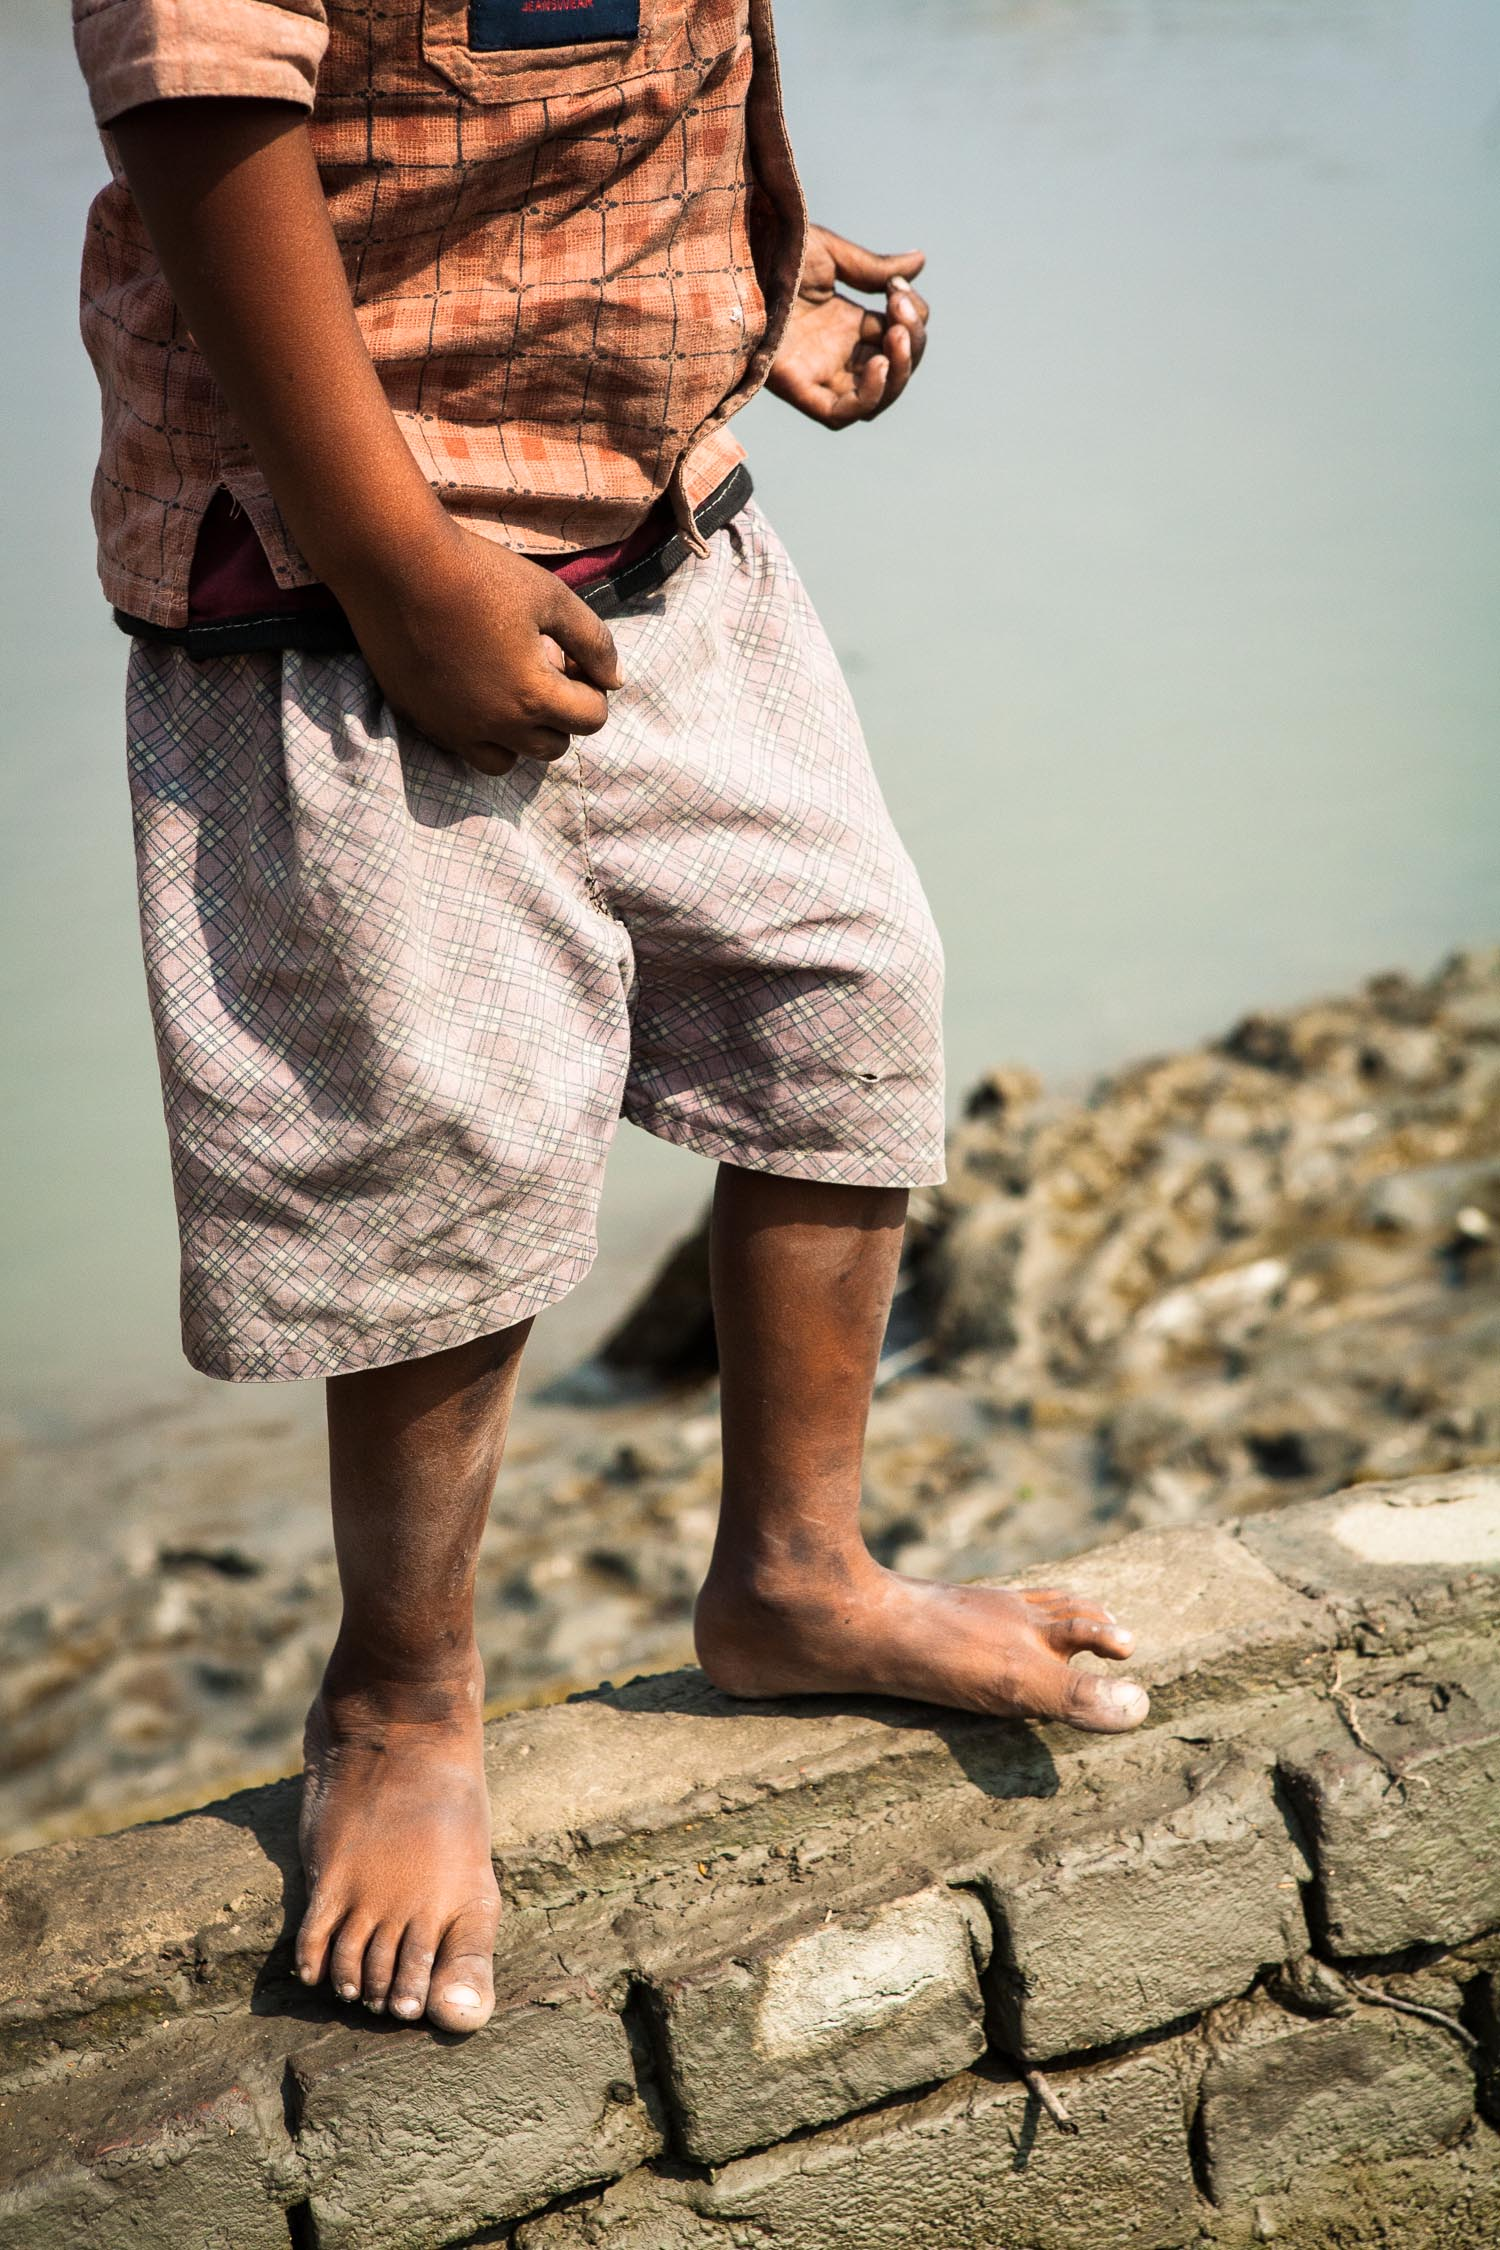 climate-migrants-bangladesh-maria-litwa-0774.jpg